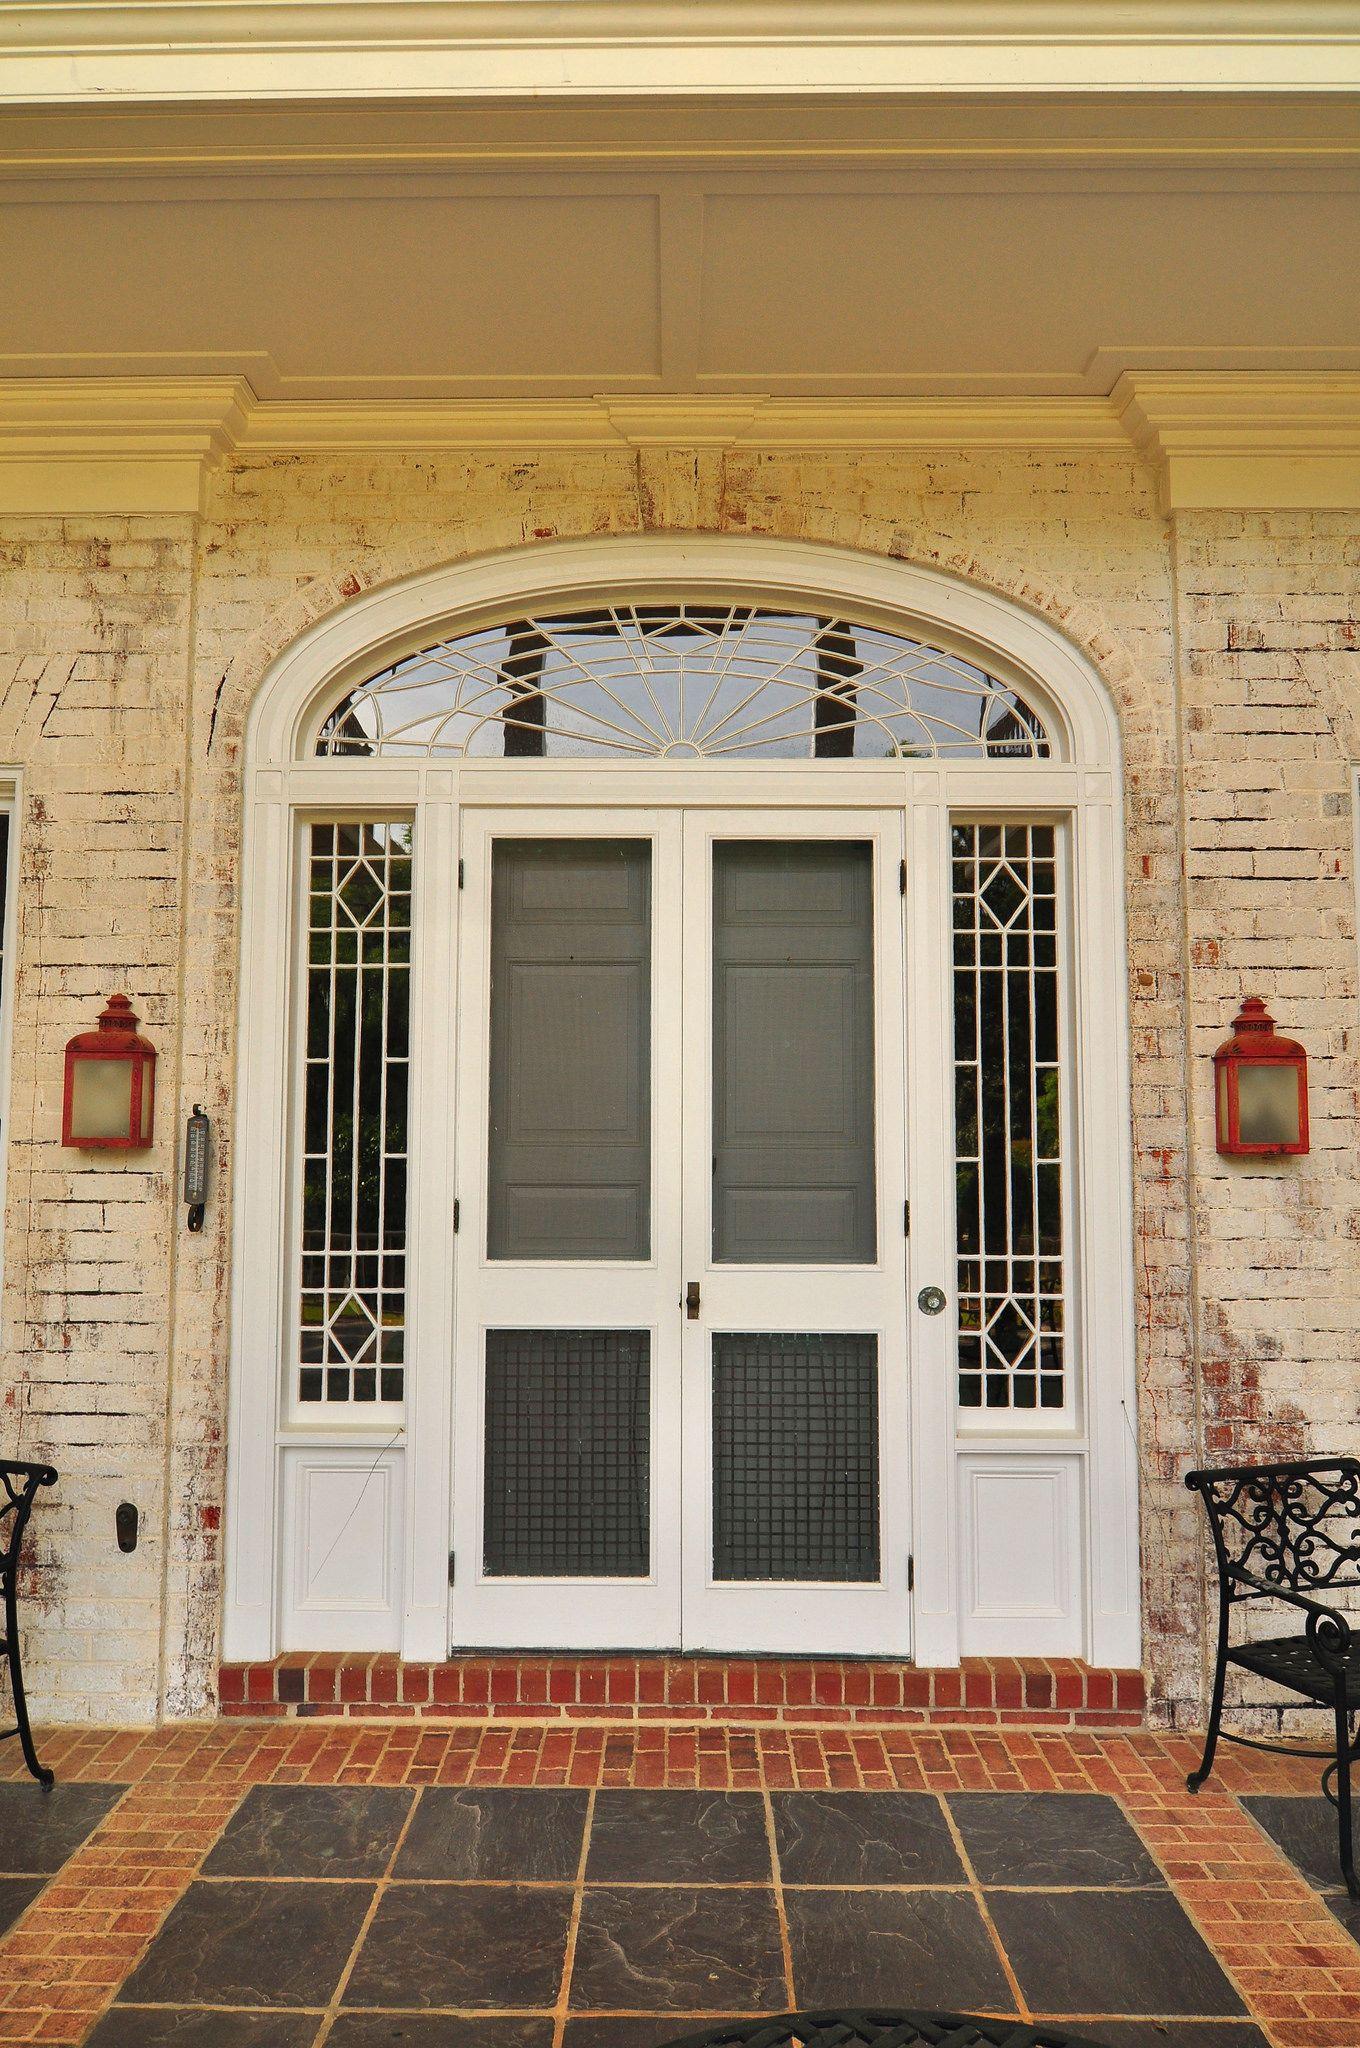 DSC_6671 Southern architecture, Architecture, Outdoor decor